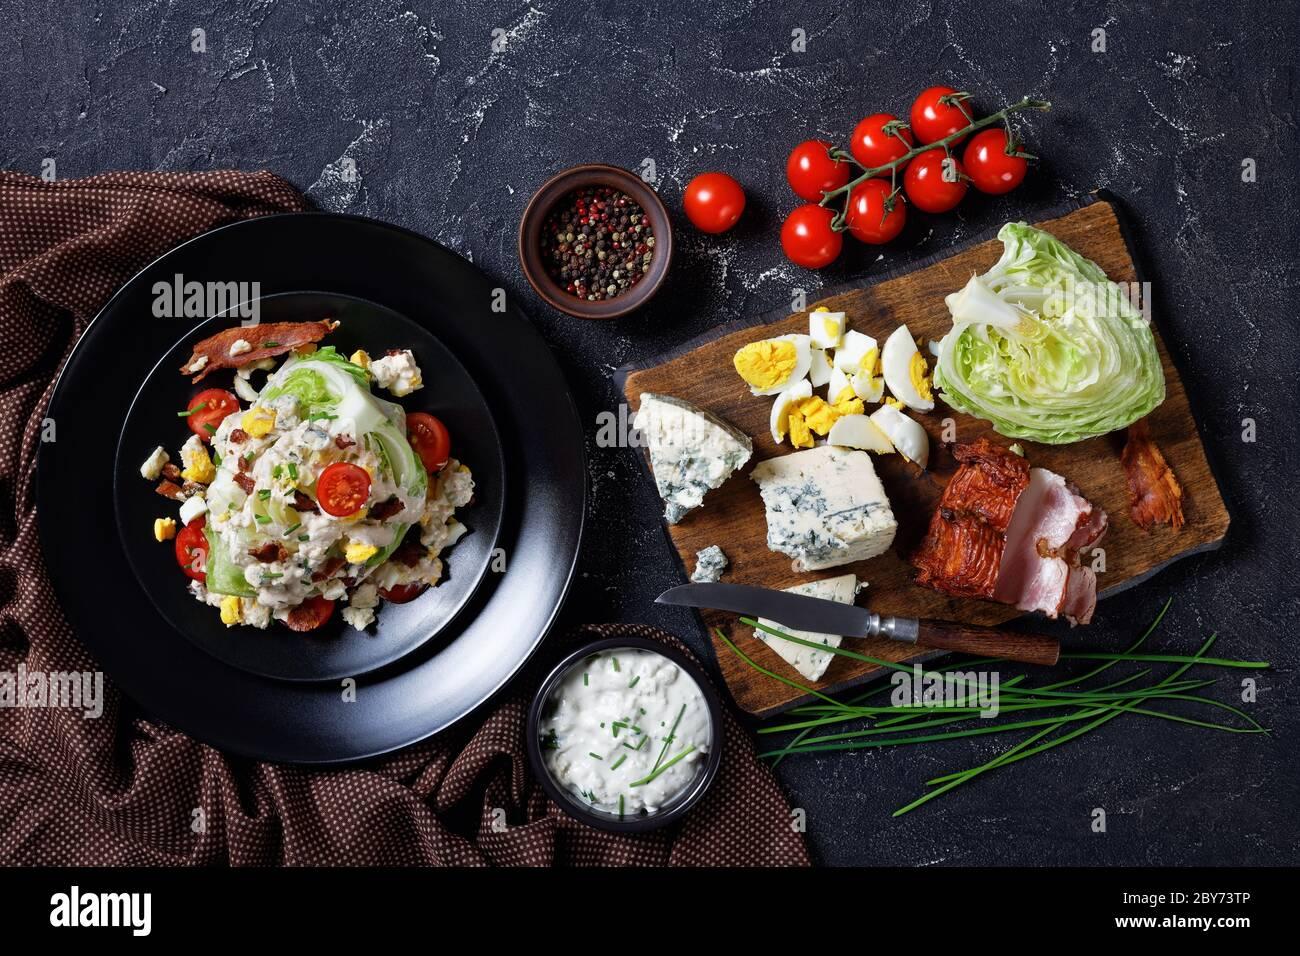 ensalada de cuña de iceberg cubierta con aderezo de queso azul, tocino frito crujiente, tomates cherry, huevos duros desmenuzados, cebolletas en platos negros en un conc Foto de stock